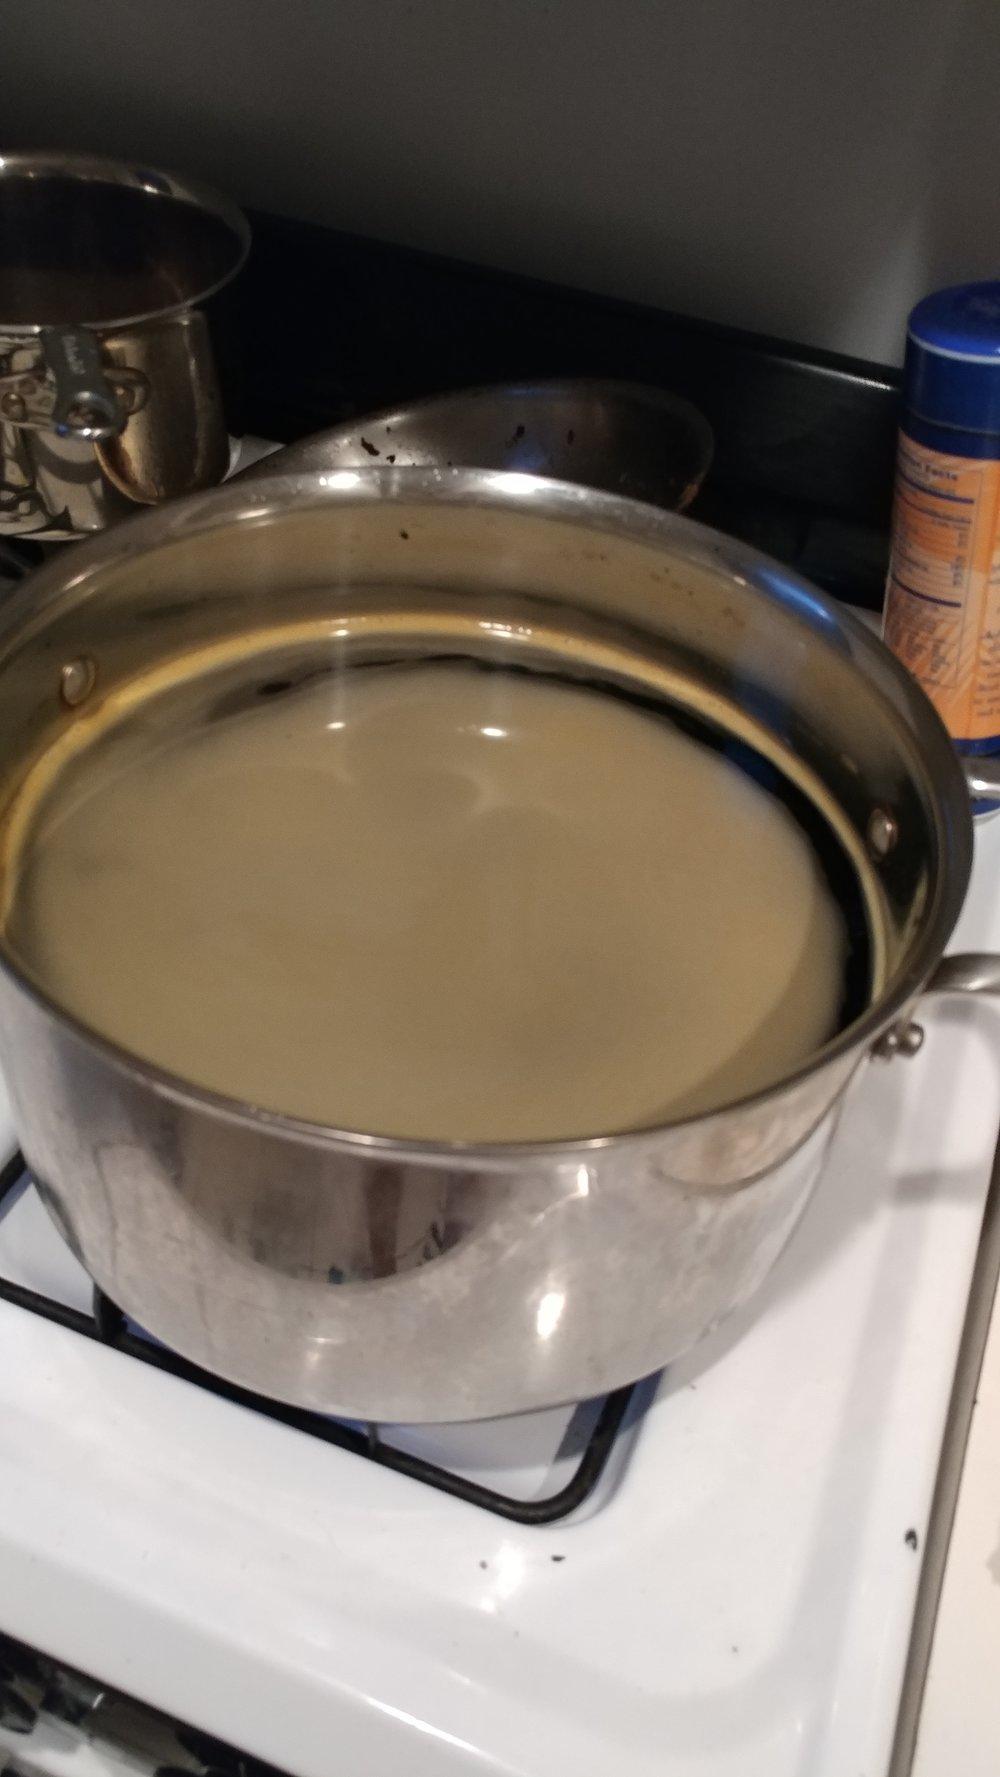 Tie Dye process - first boil water and add dye